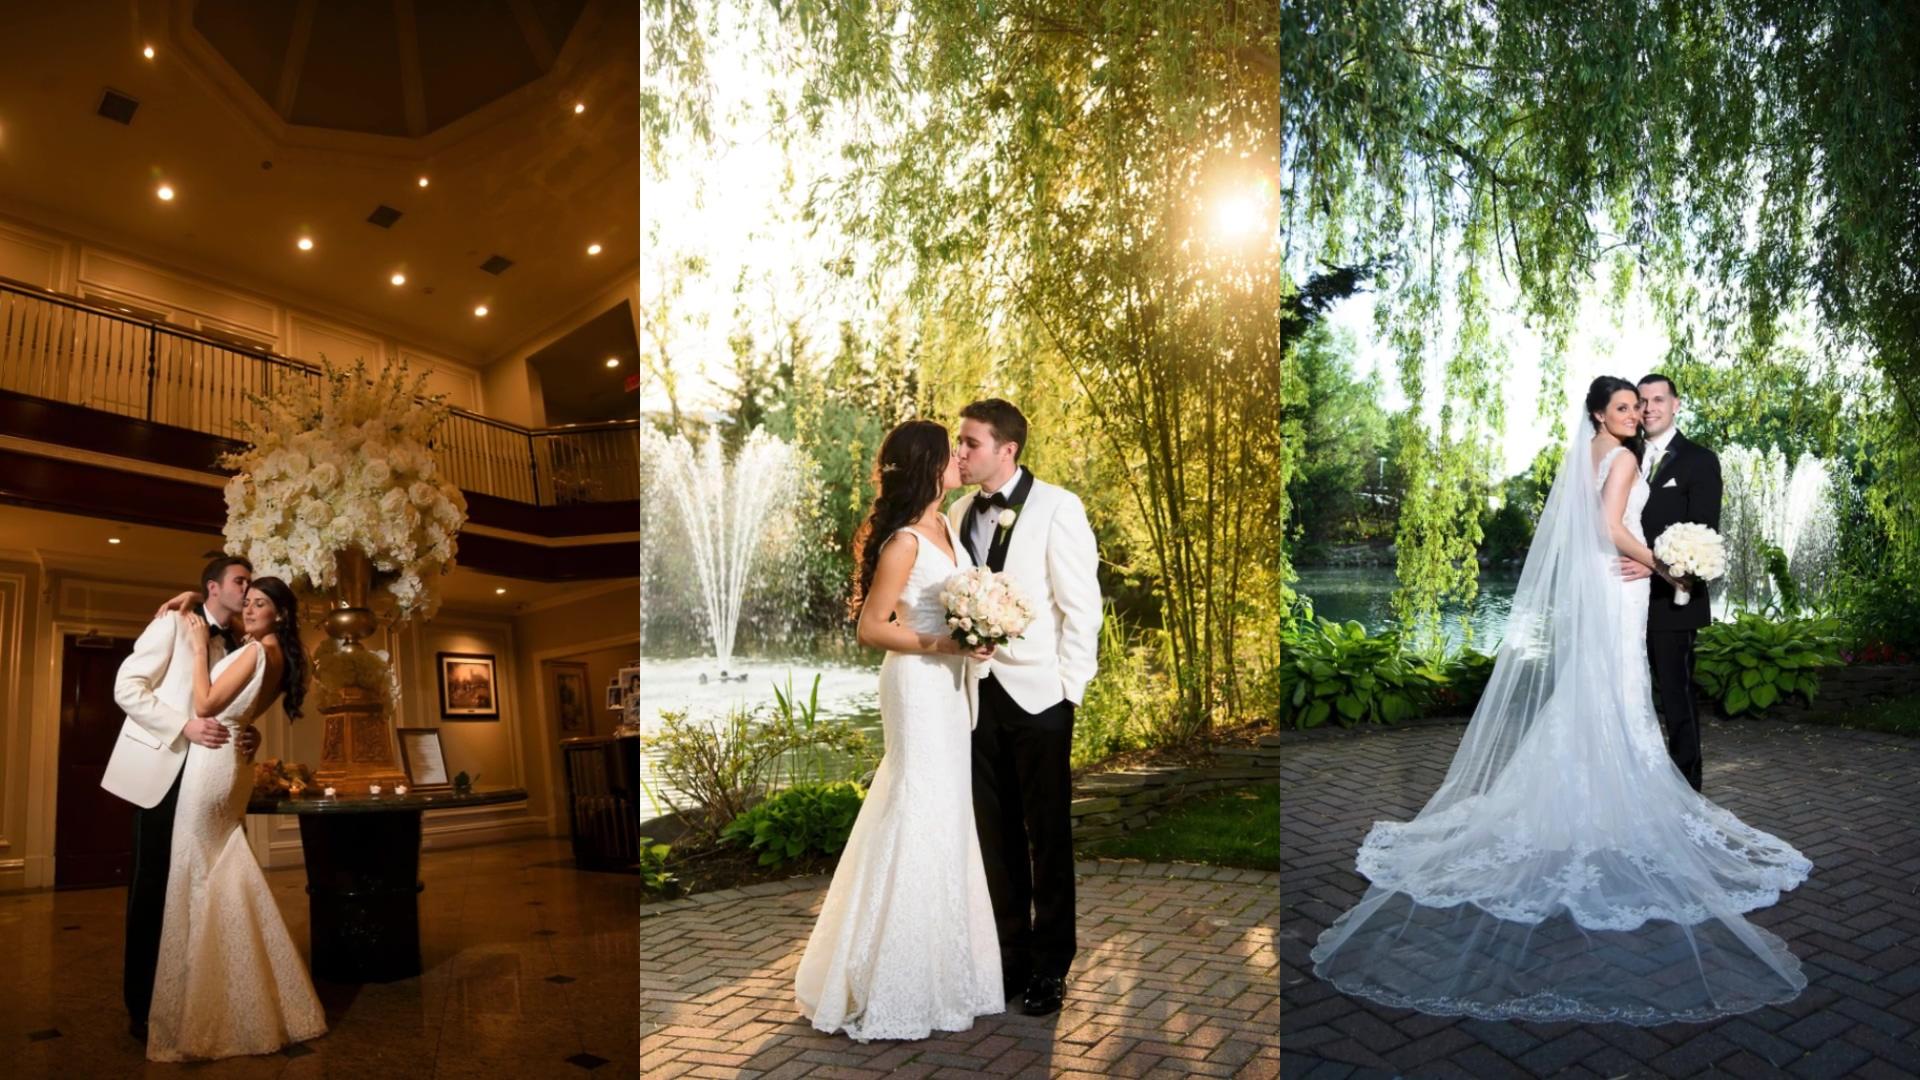 2020_North_Ritz_Club_Wedding_Photos_1080p